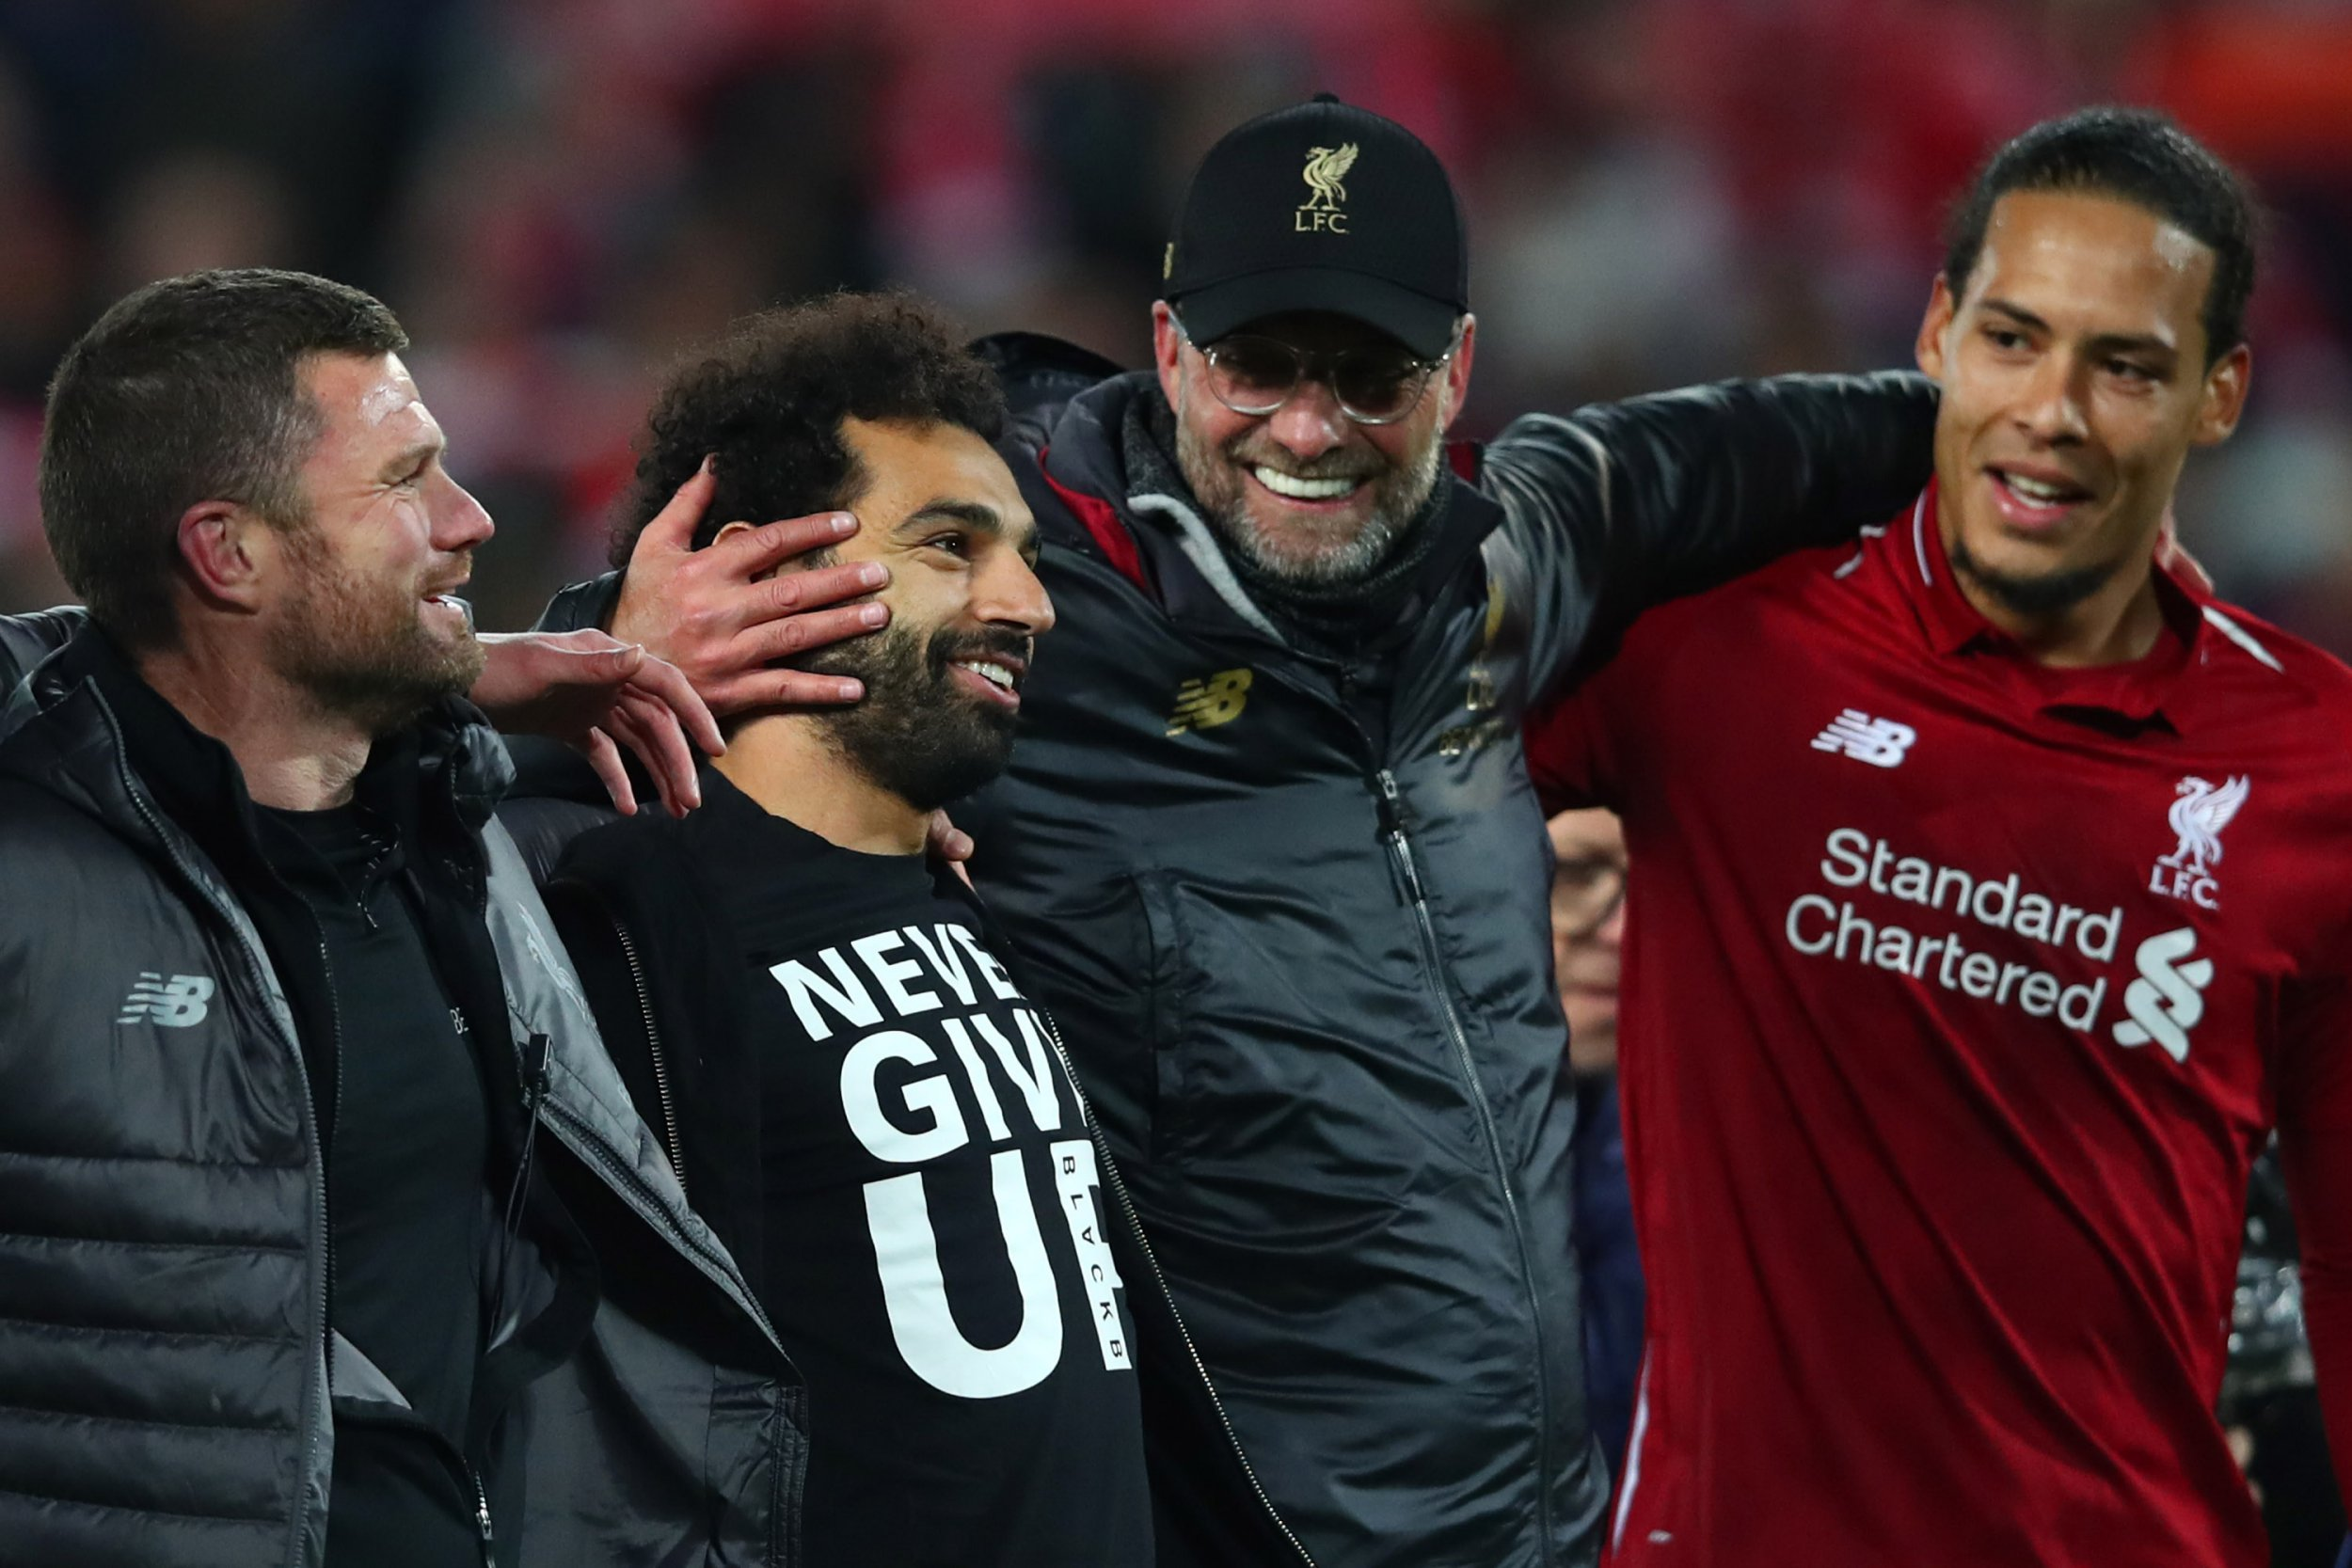 Mo Salah, Andrew Robertson and Roberto Firmino injury updates from Liverpool boss Jurgen Klopp